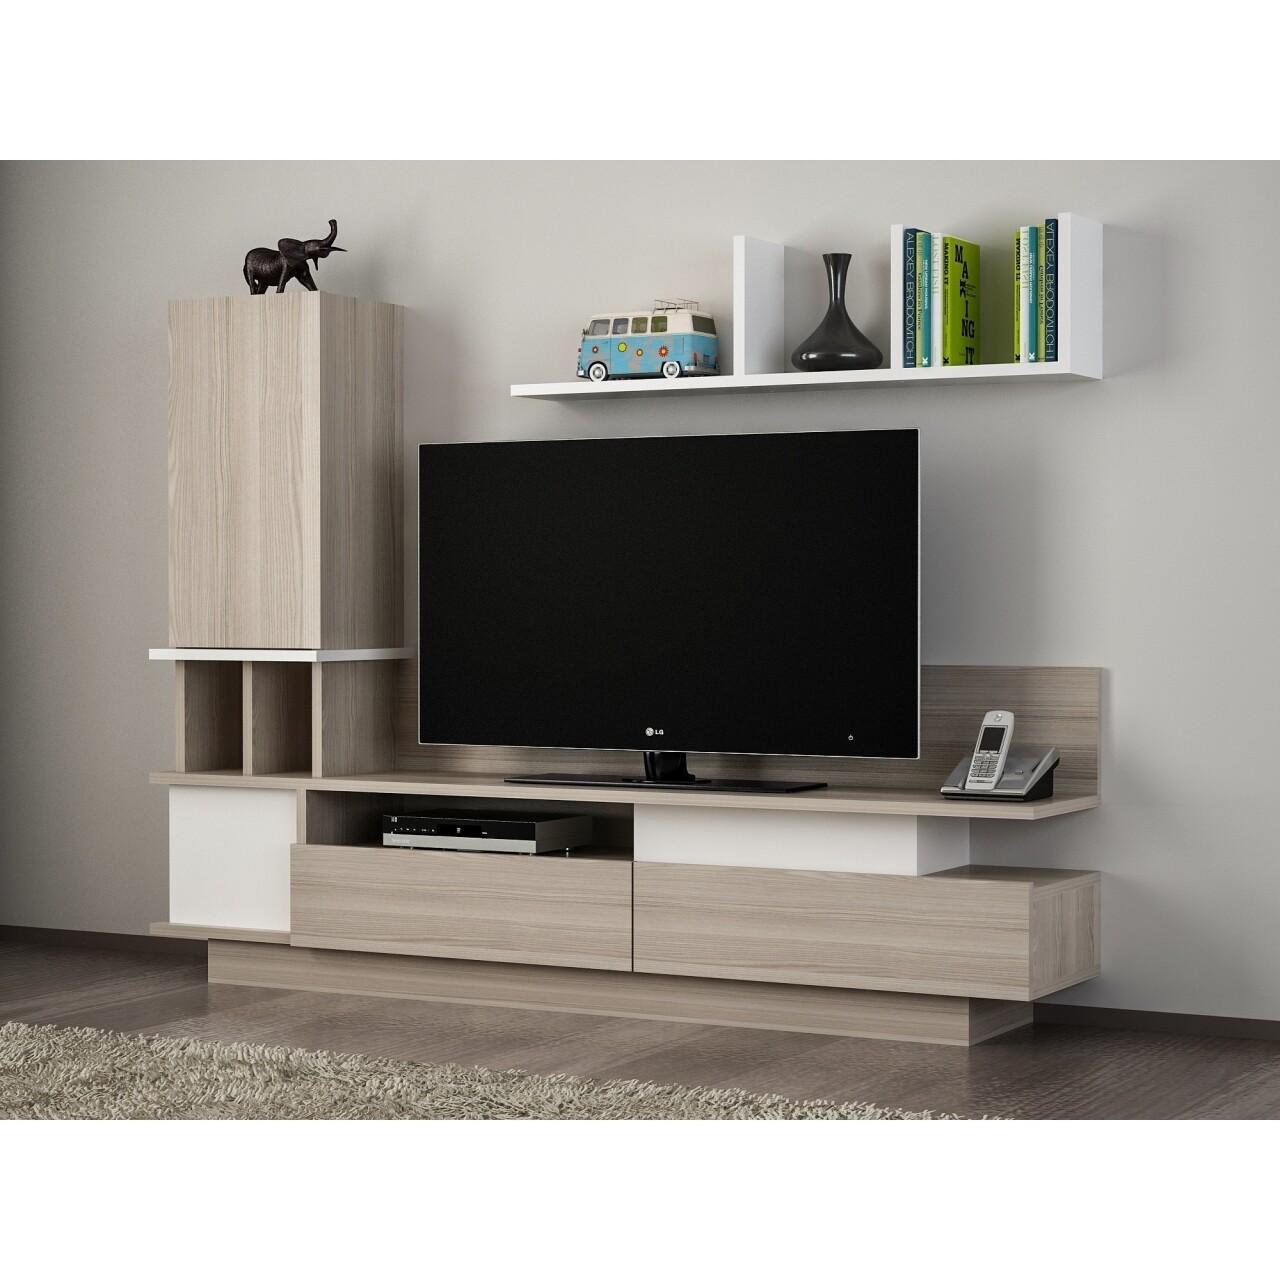 Comoda TV cu biblioteca si raft, Wooden Art, Como White Cordoba, 149x171.1x31.5 cm